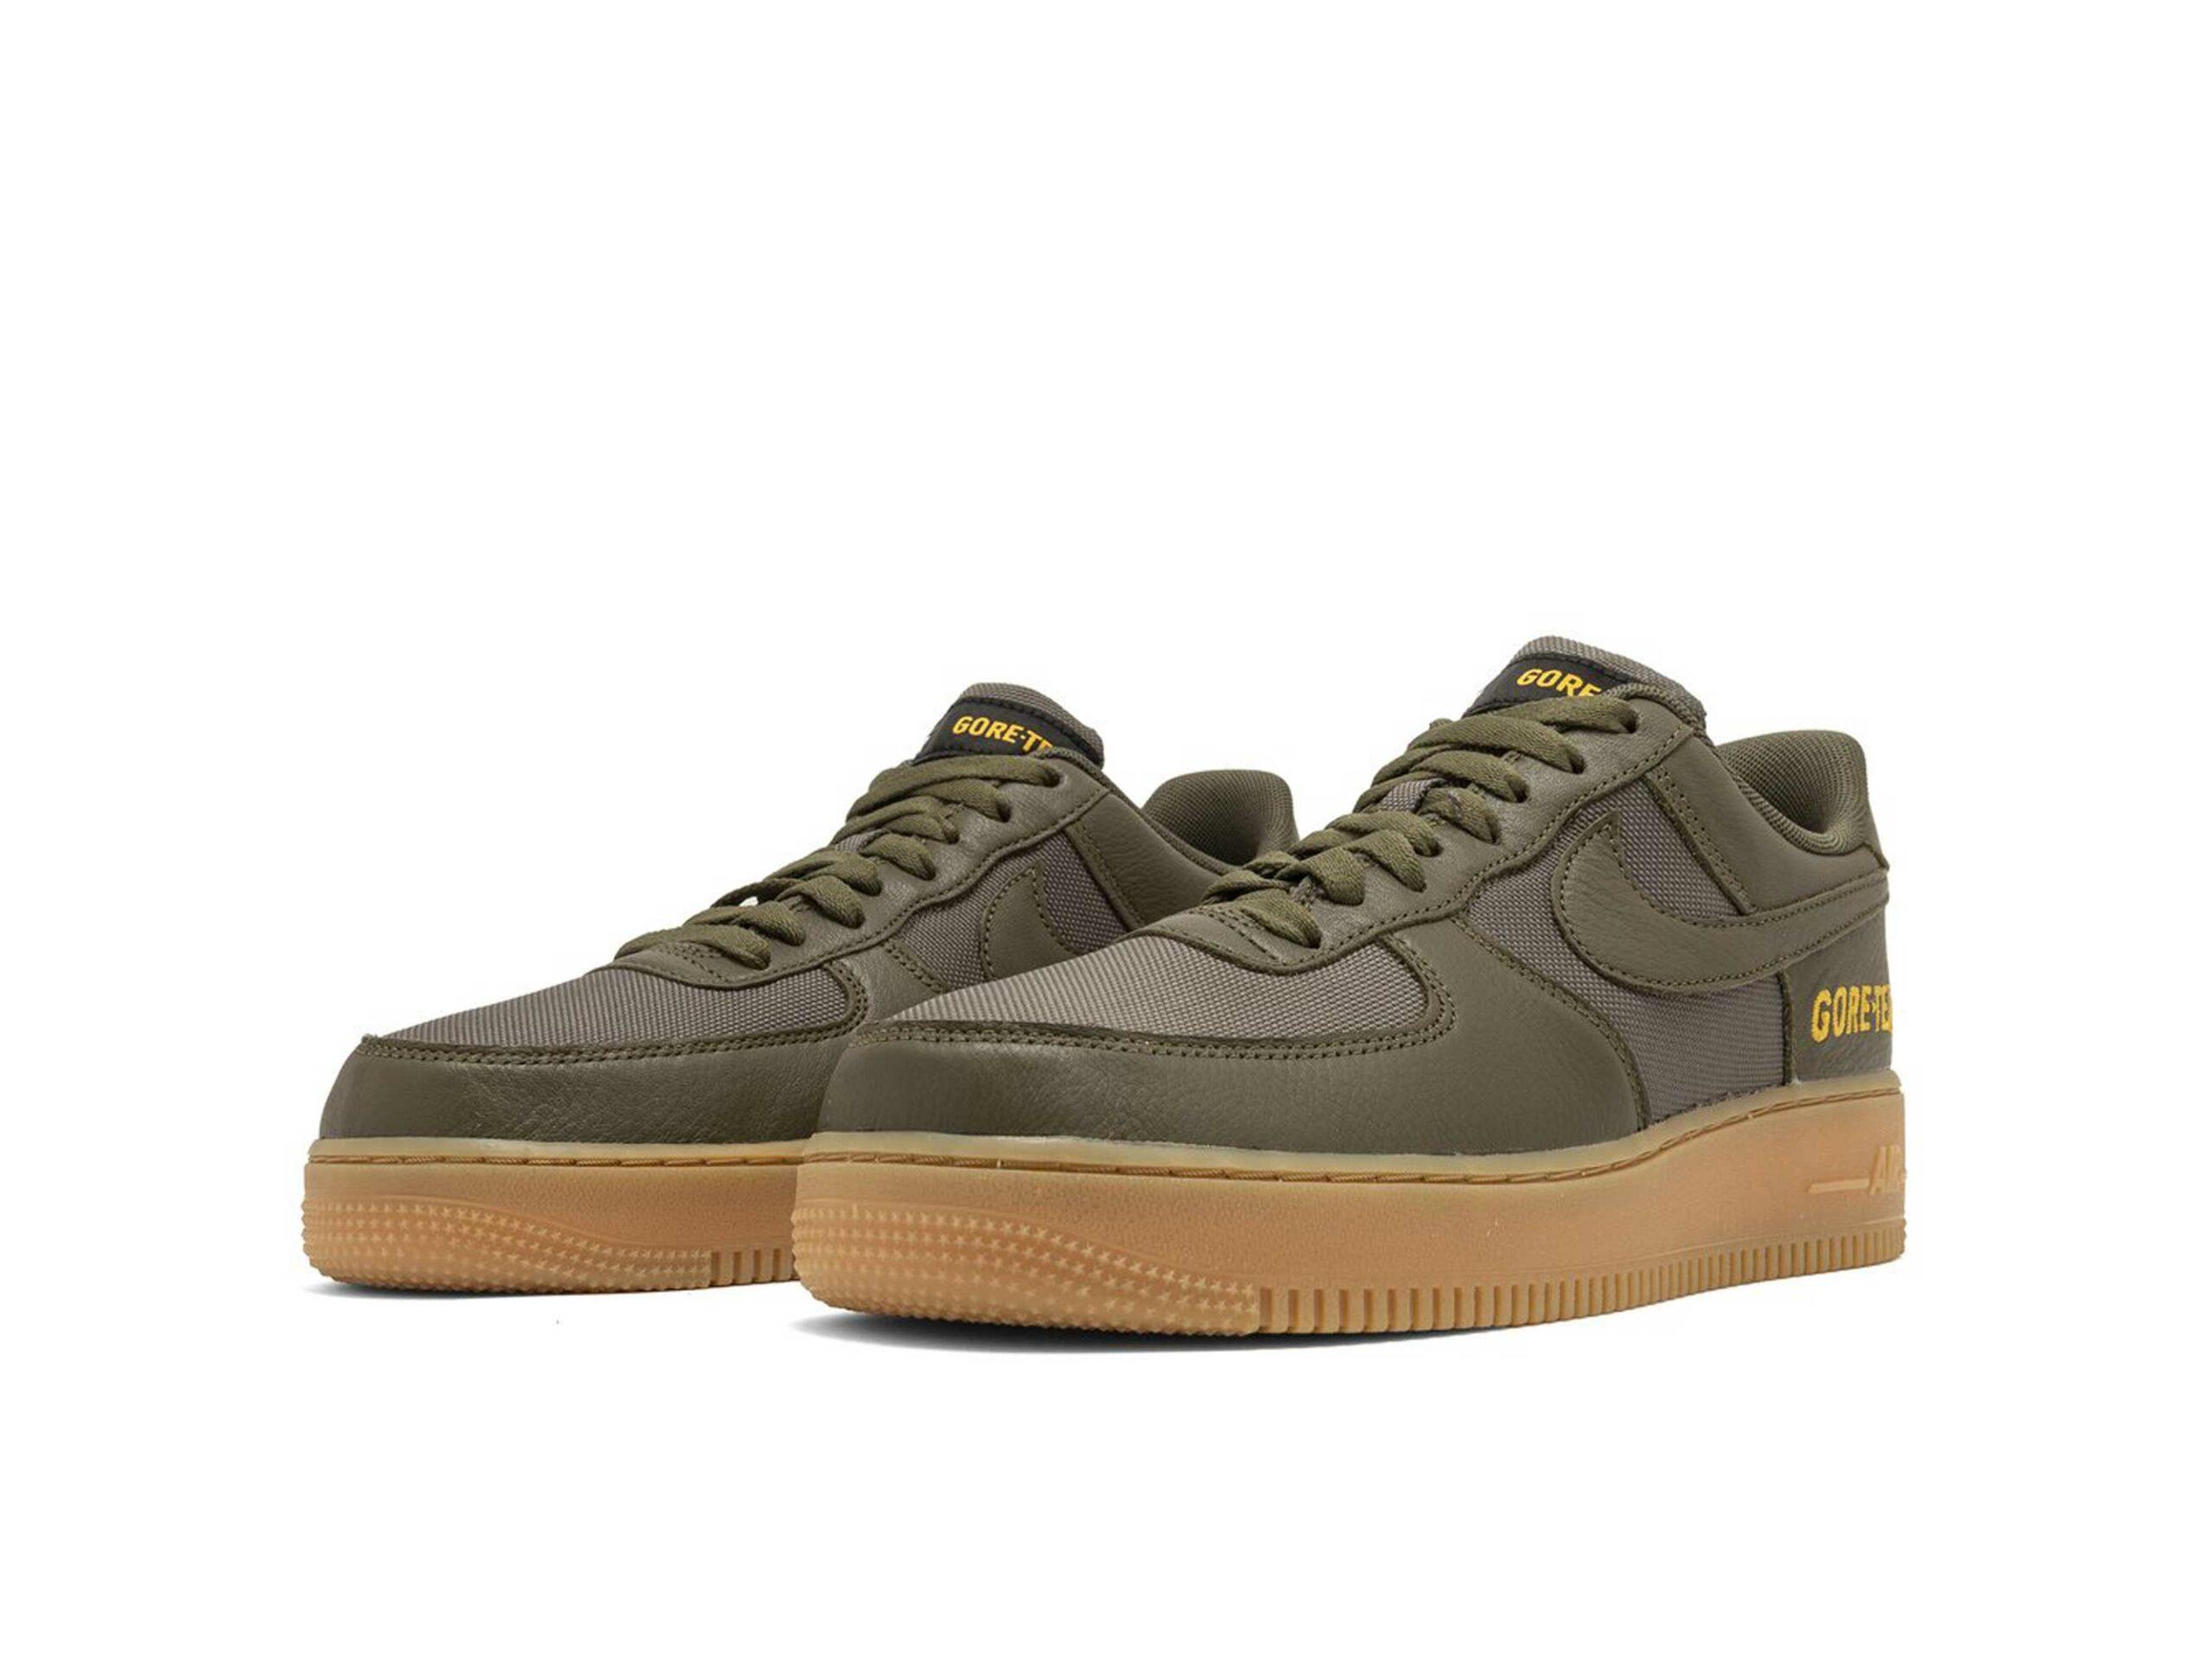 nike air force 1 low gore tex medium olive CK2630_200 купить